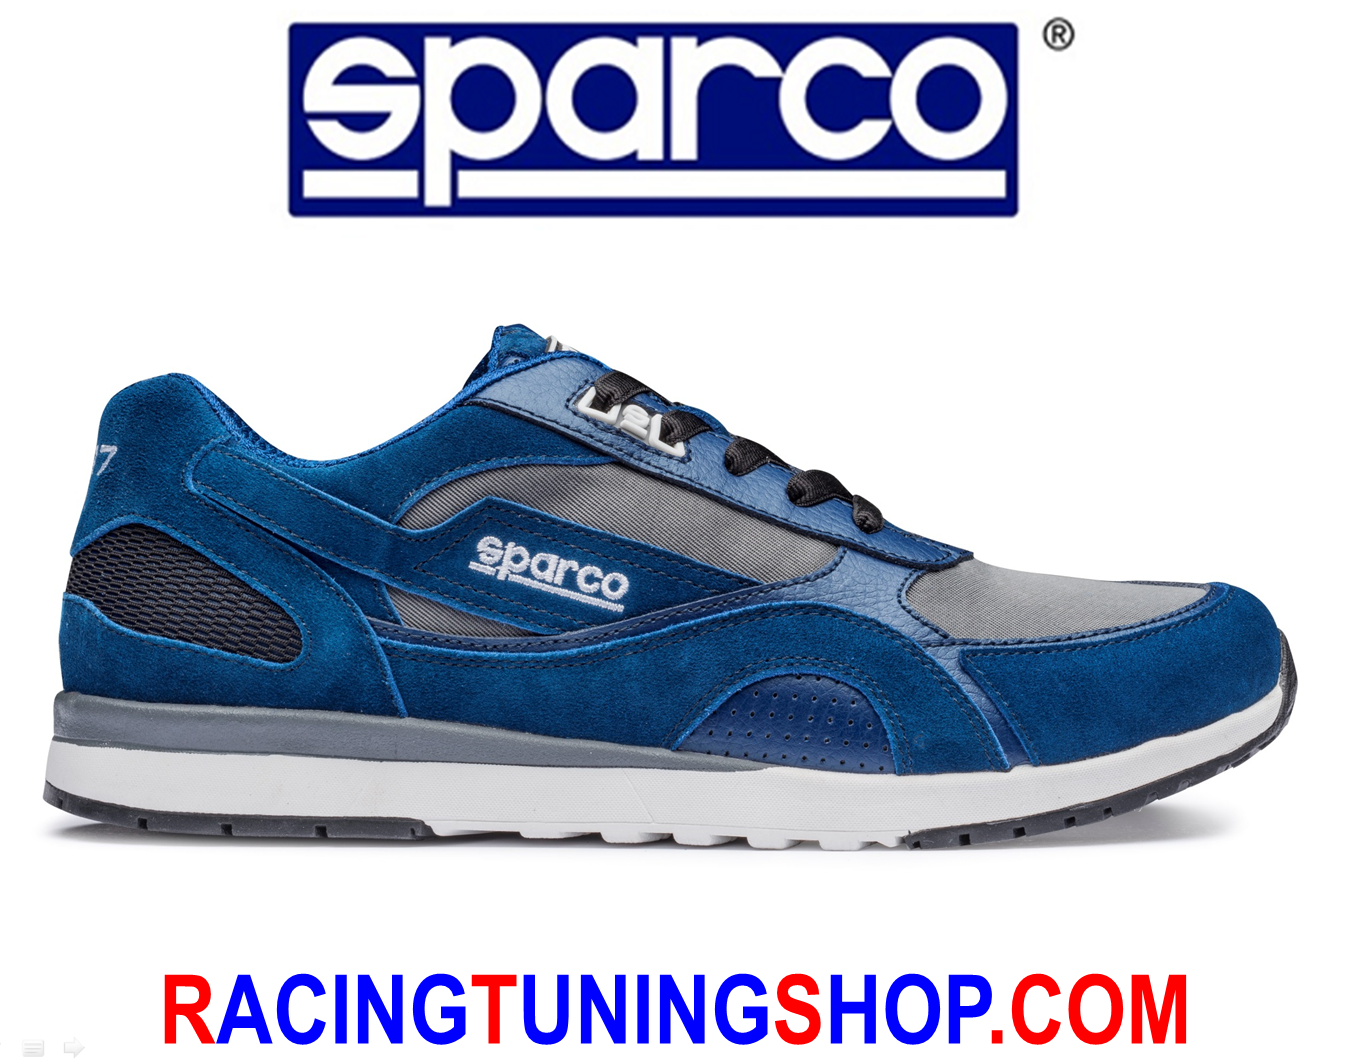 shoes SPARCO SH-17 blue - SPARCO TEAMWEAR SHOES SNEAKERS EU 41 SCHUHE WOMAN MAN